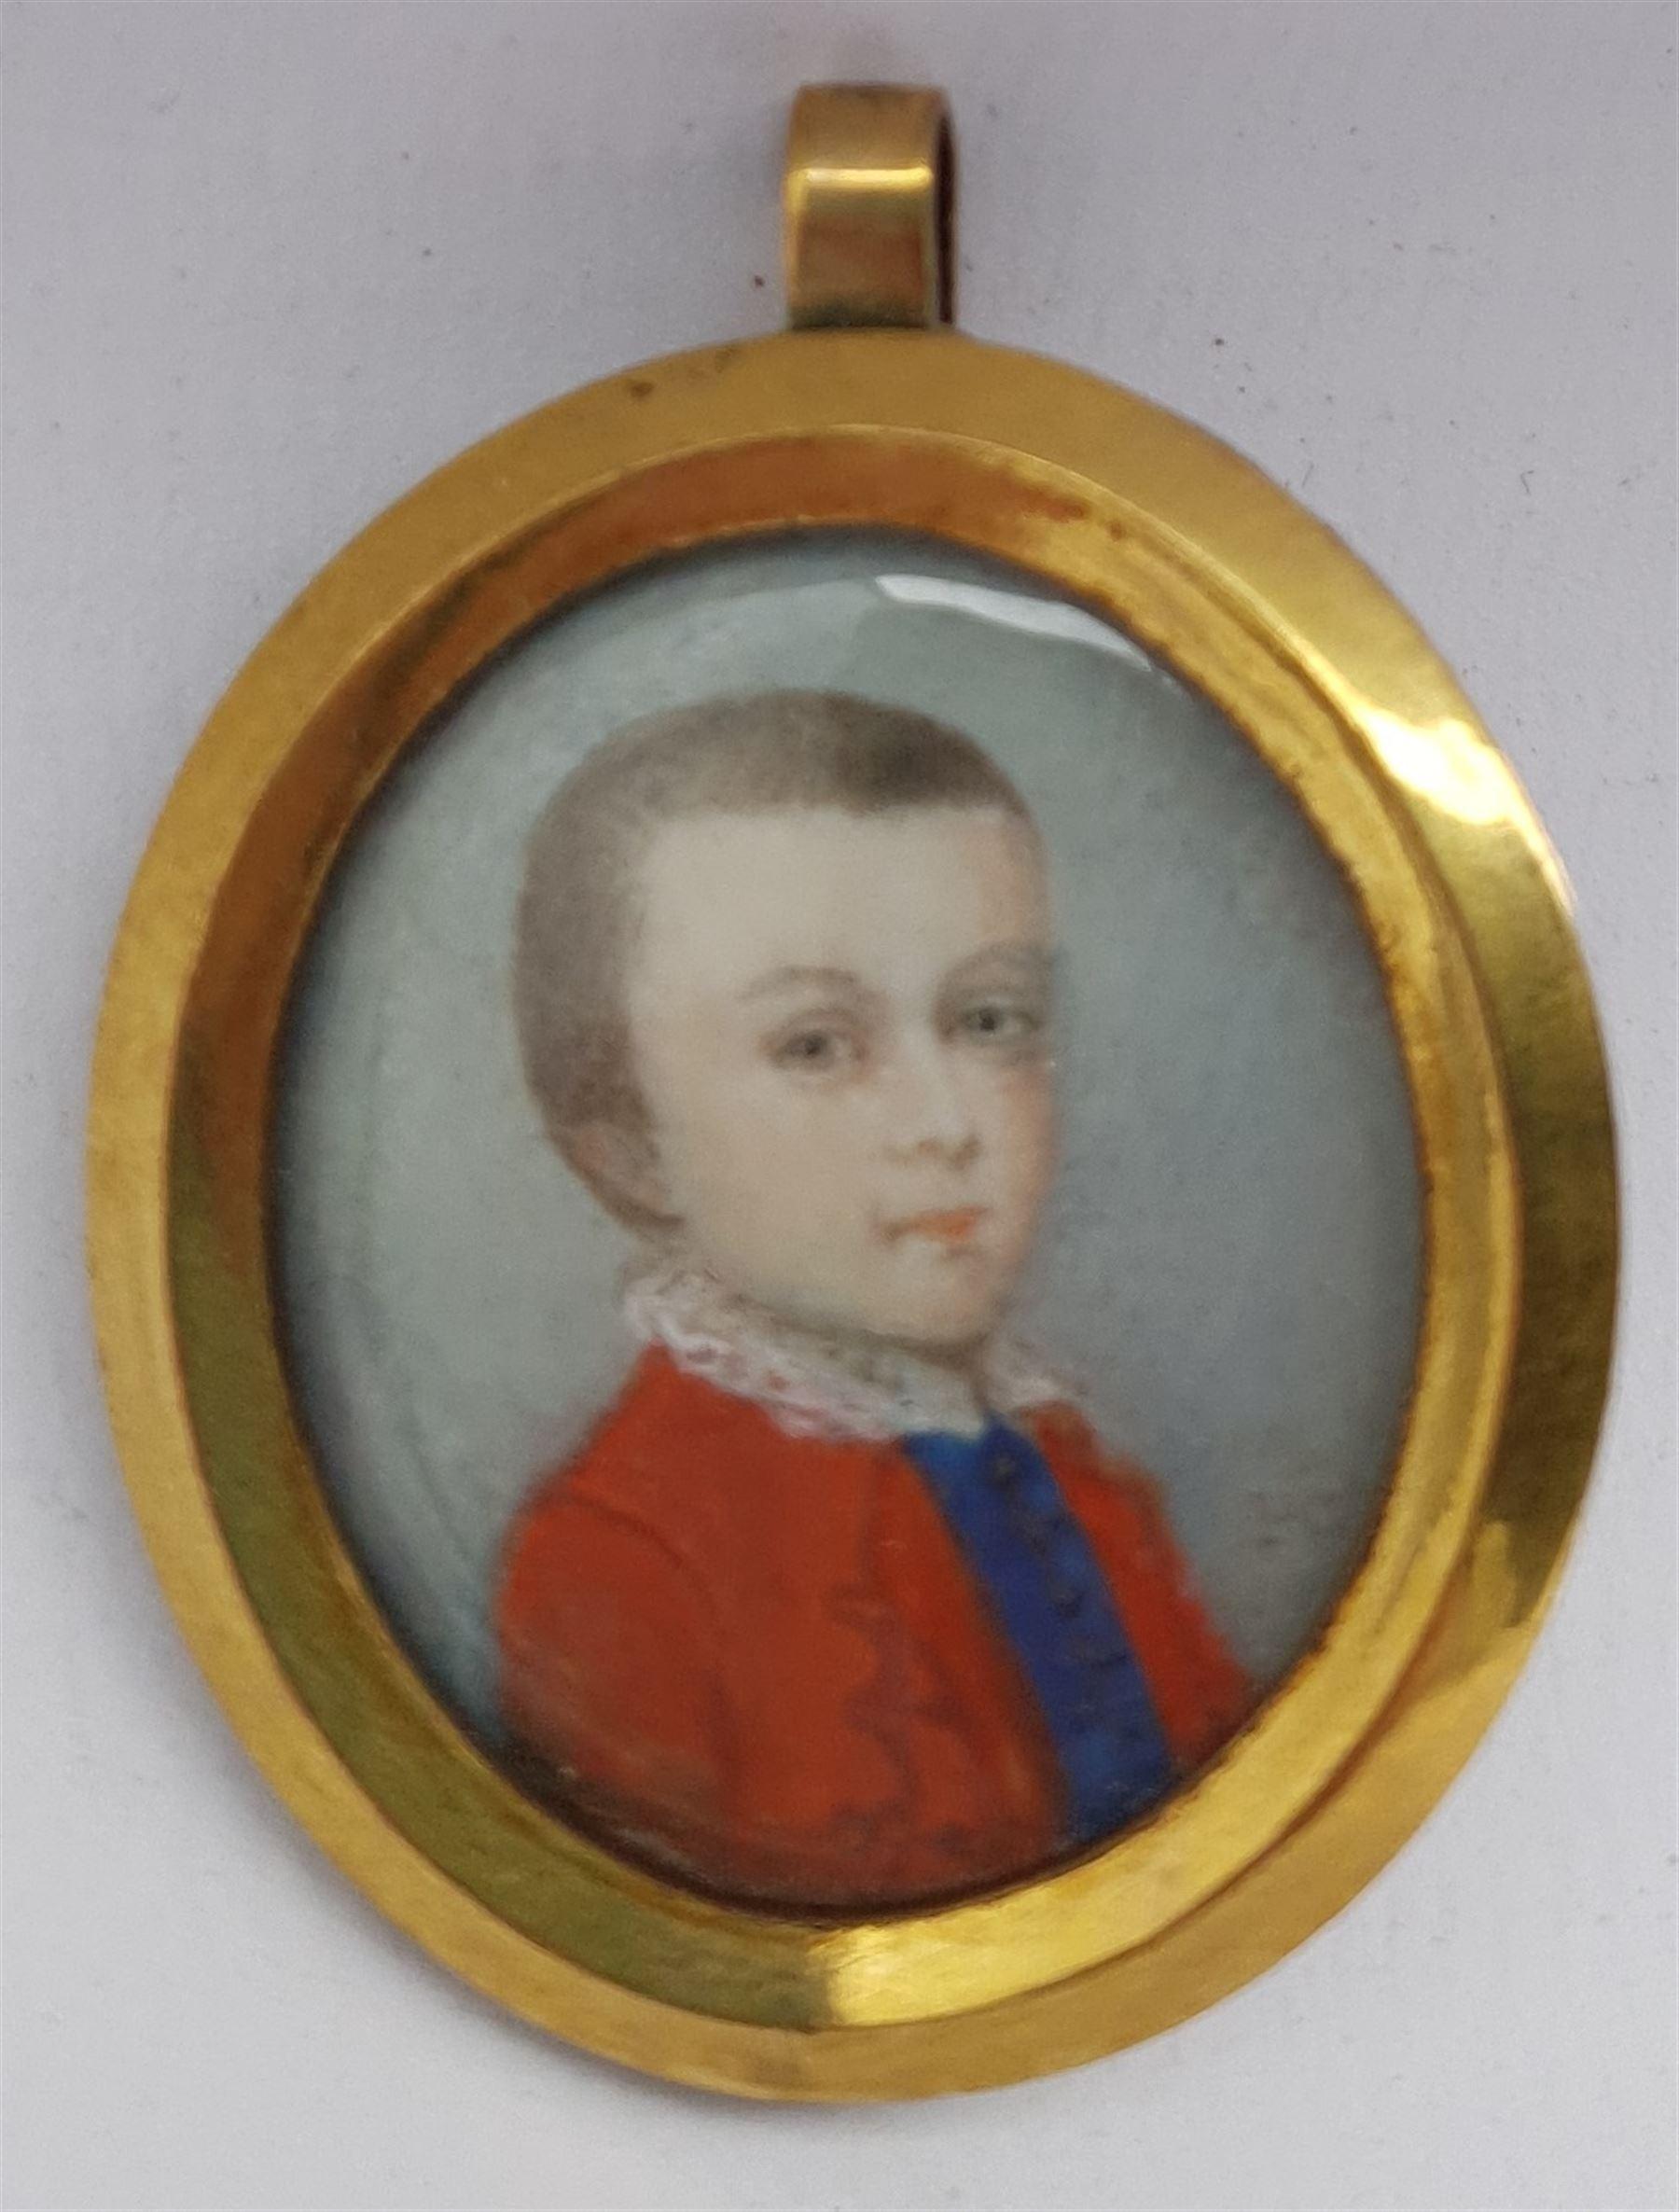 Penelope Carwardine (British 1729-1804): 'Justinian Saunders Bentley Nutt'